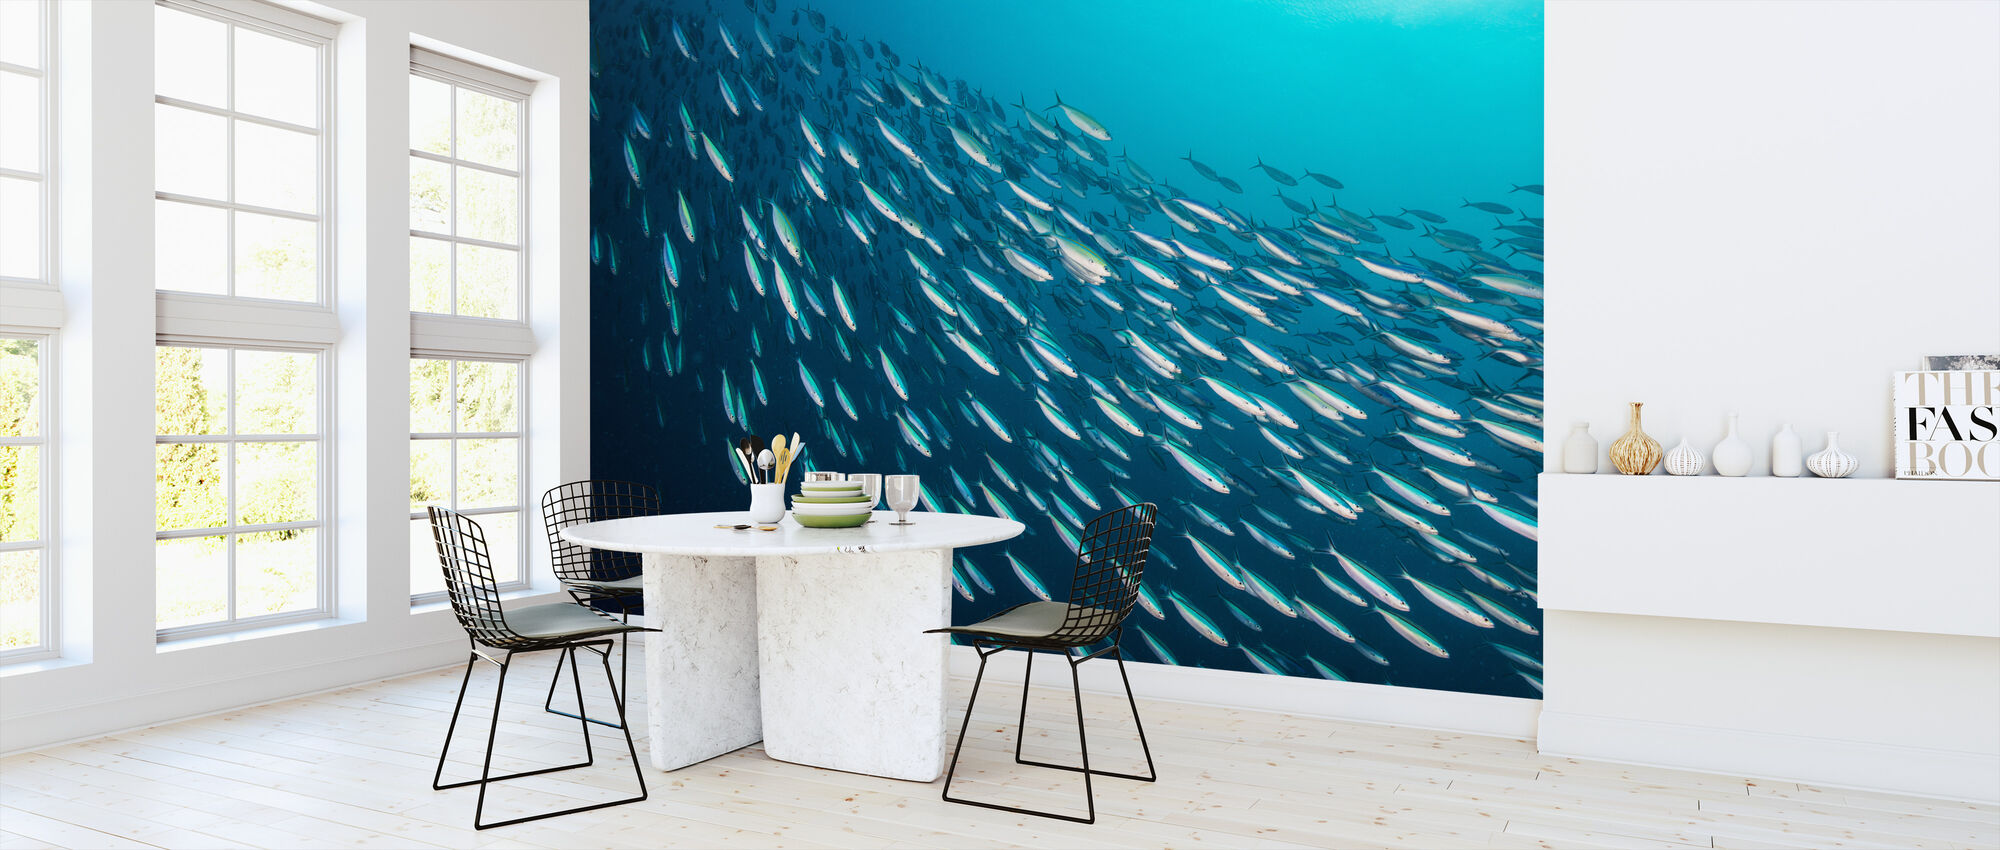 School of Sardines - Wallpaper - Kitchen